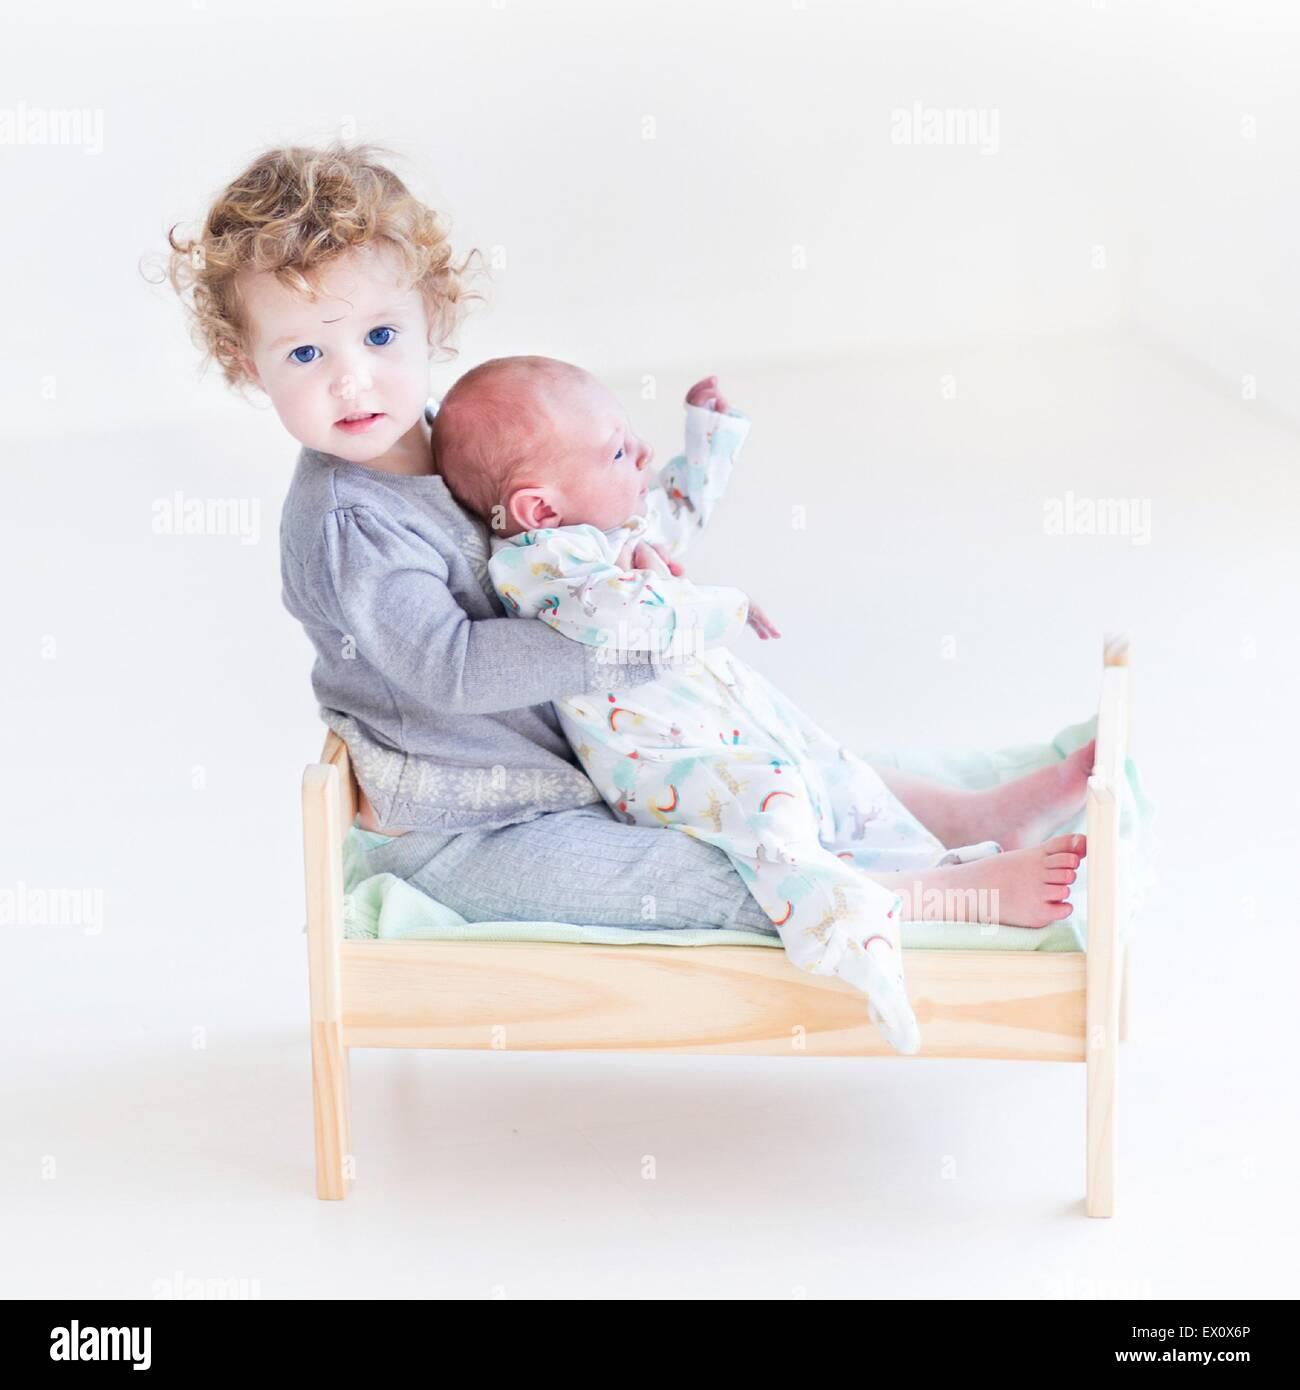 sibling stockfotos sibling bilder alamy. Black Bedroom Furniture Sets. Home Design Ideas